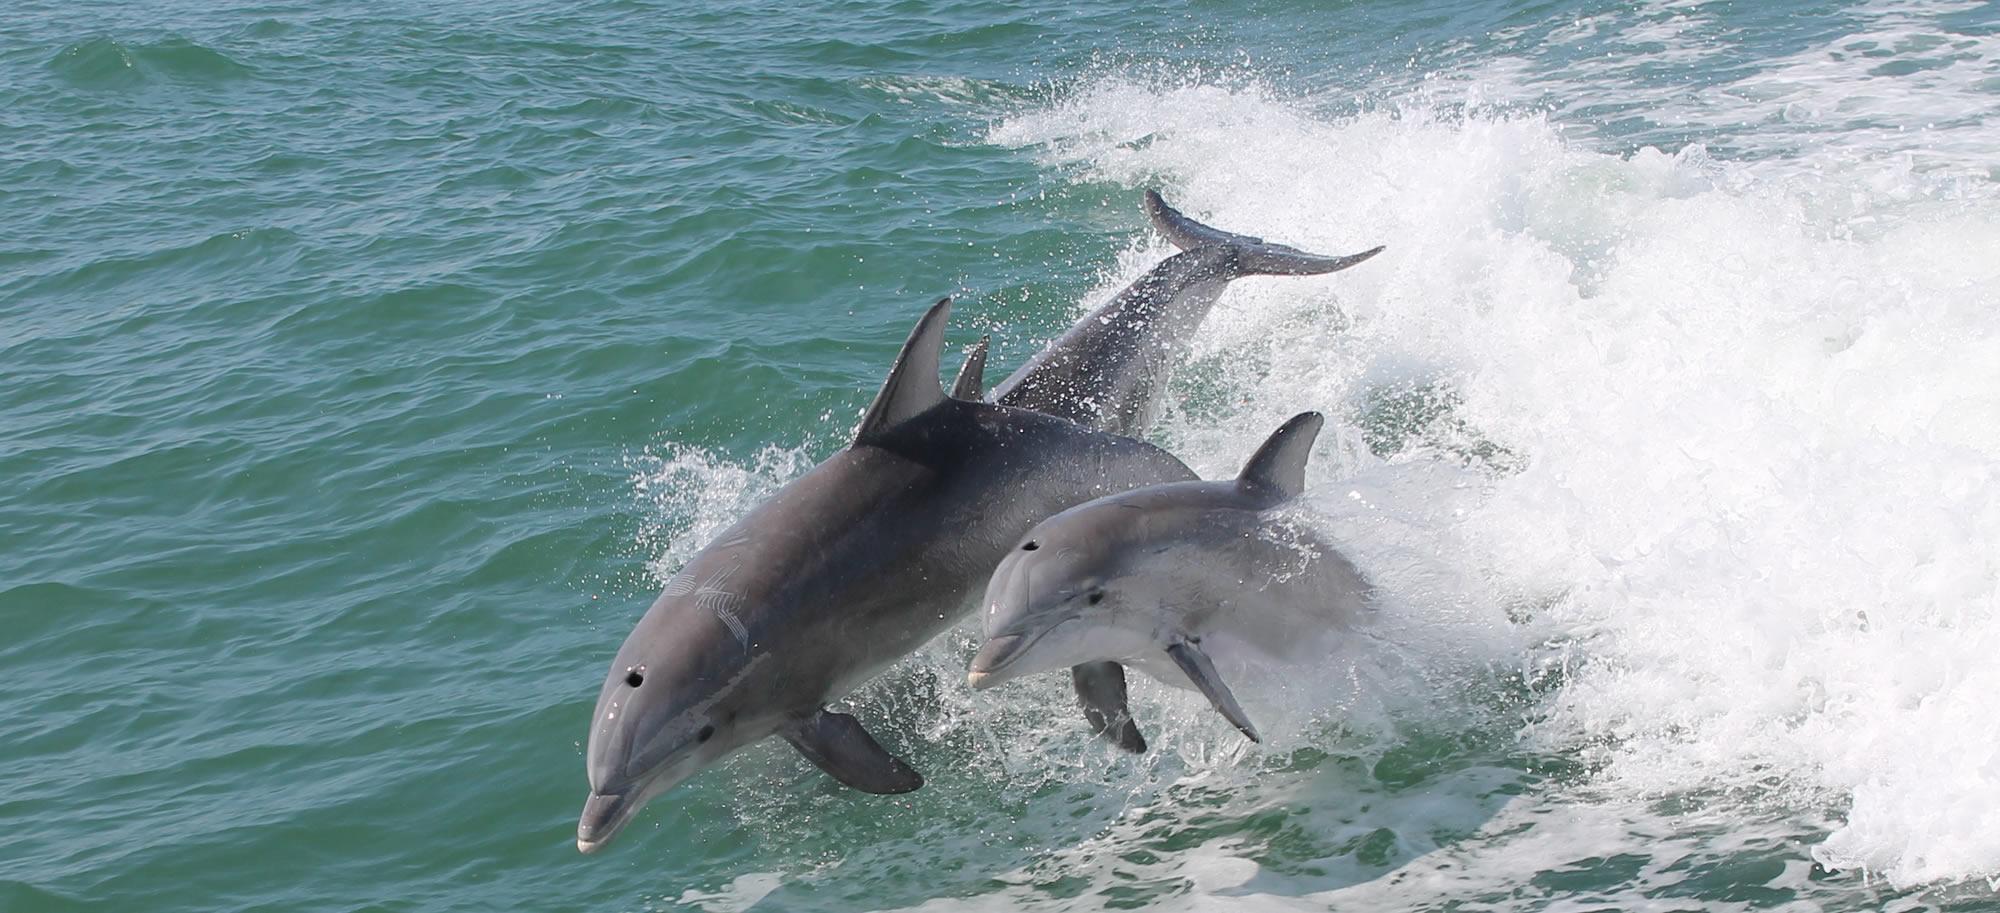 Thunder Cat Dolphin Watch Amp Speedboat Tours Wildwood